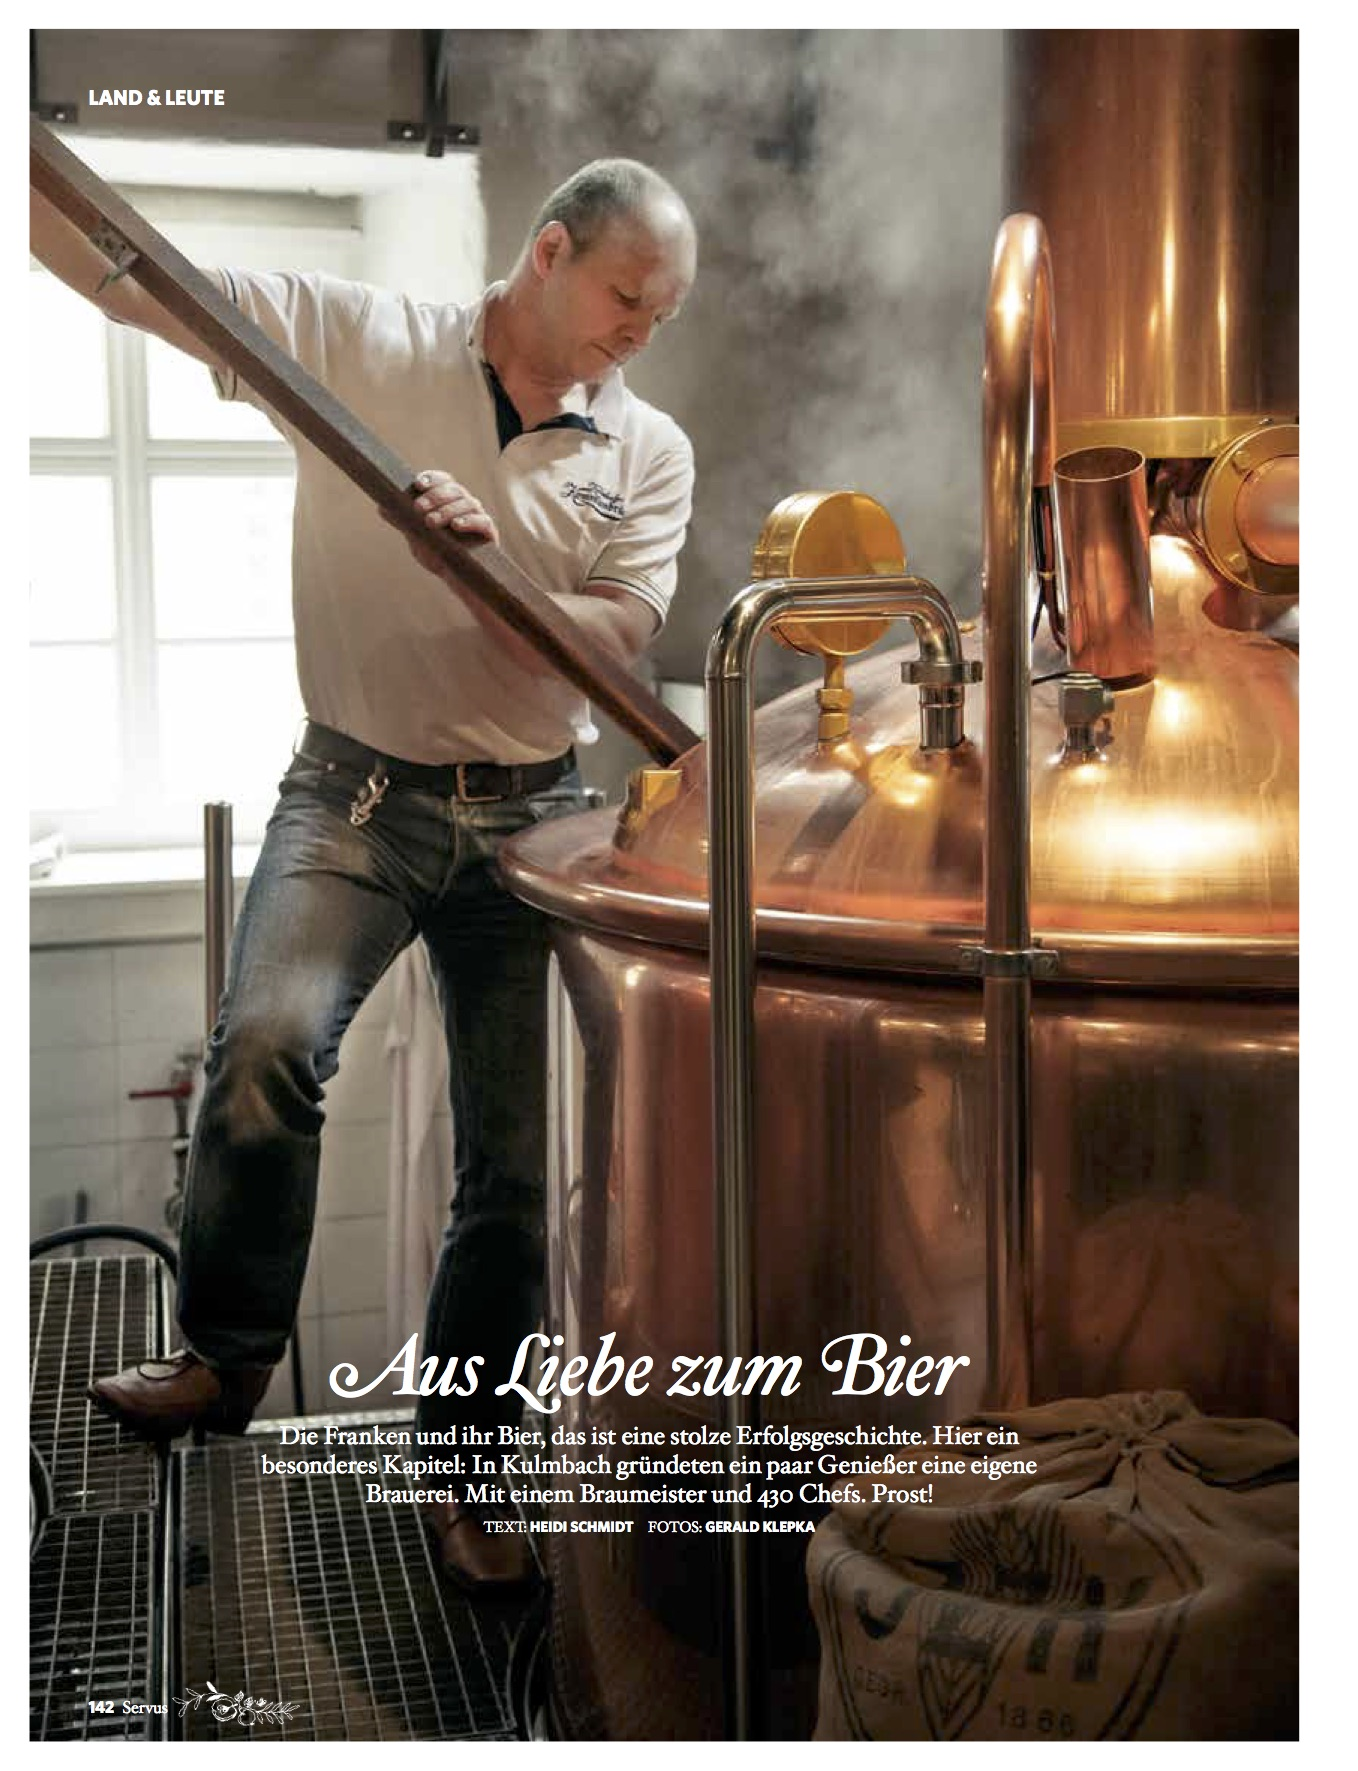 arbeitsprobe-heidi-schmidt-kulturwelten-bier